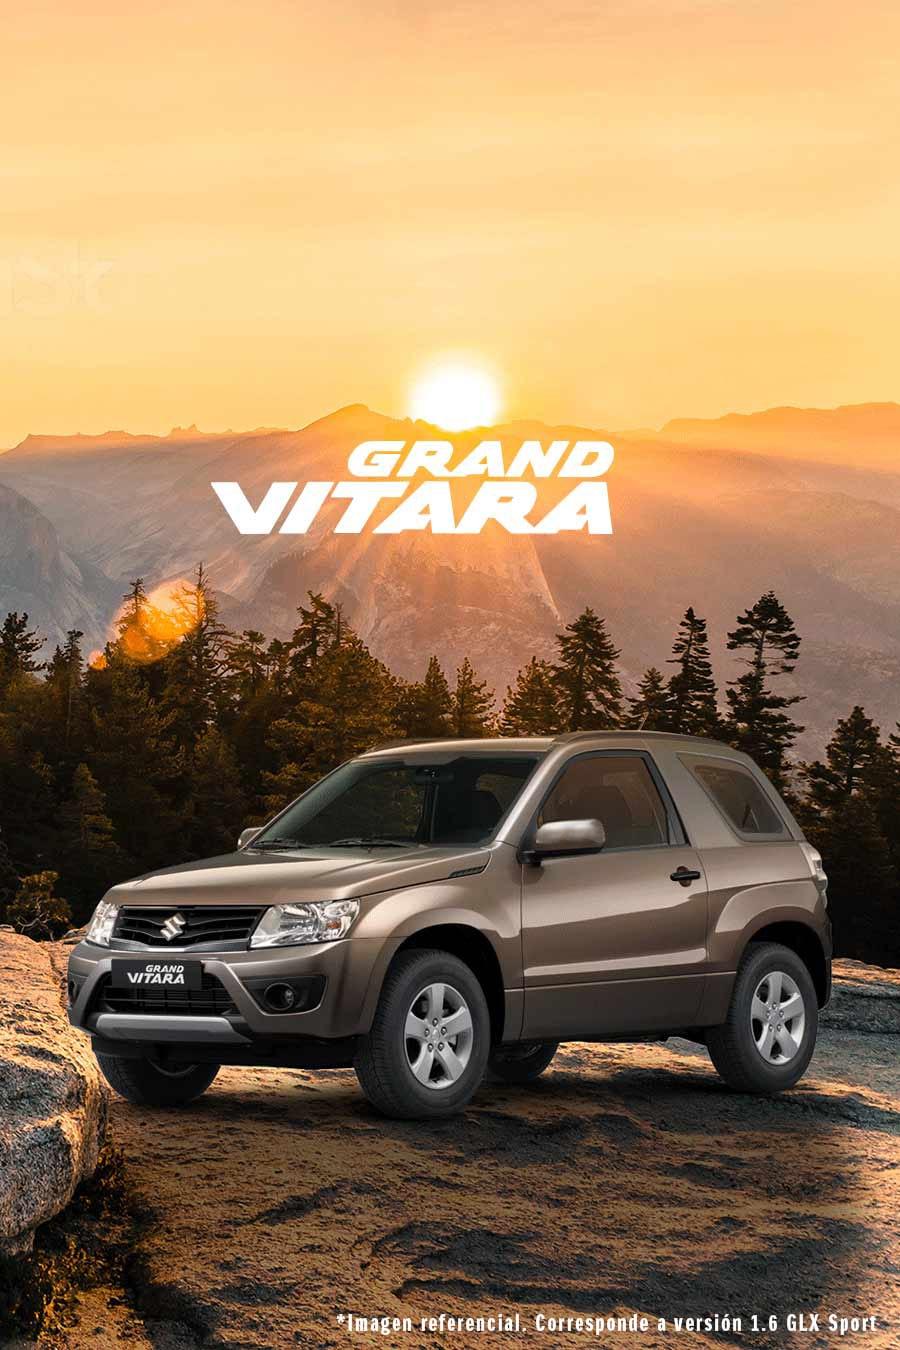 Suzuki Grand Vitara 2019 : suzuki, grand, vitara, Suzuki, Grand, Vitara, Puertas, Interior, Review